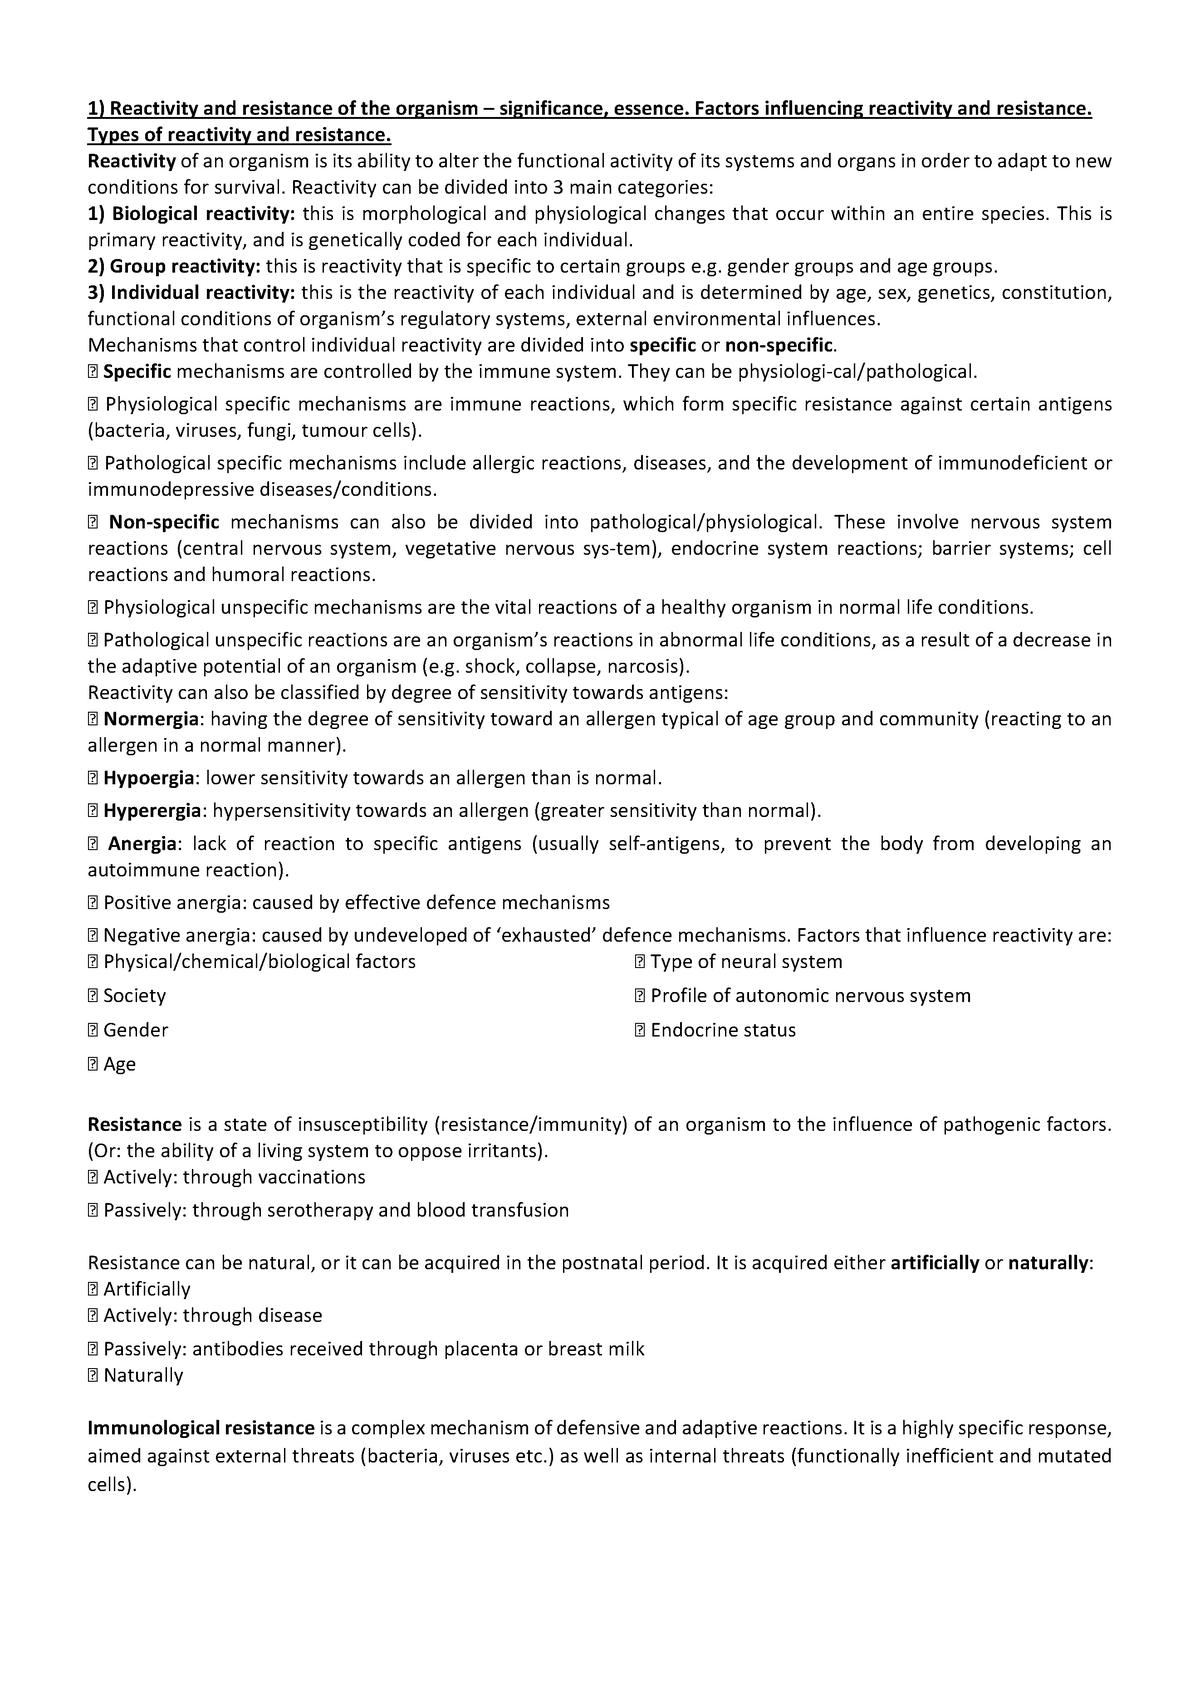 Pathophysiology full notes - MBBS1: Medicine - StuDocu